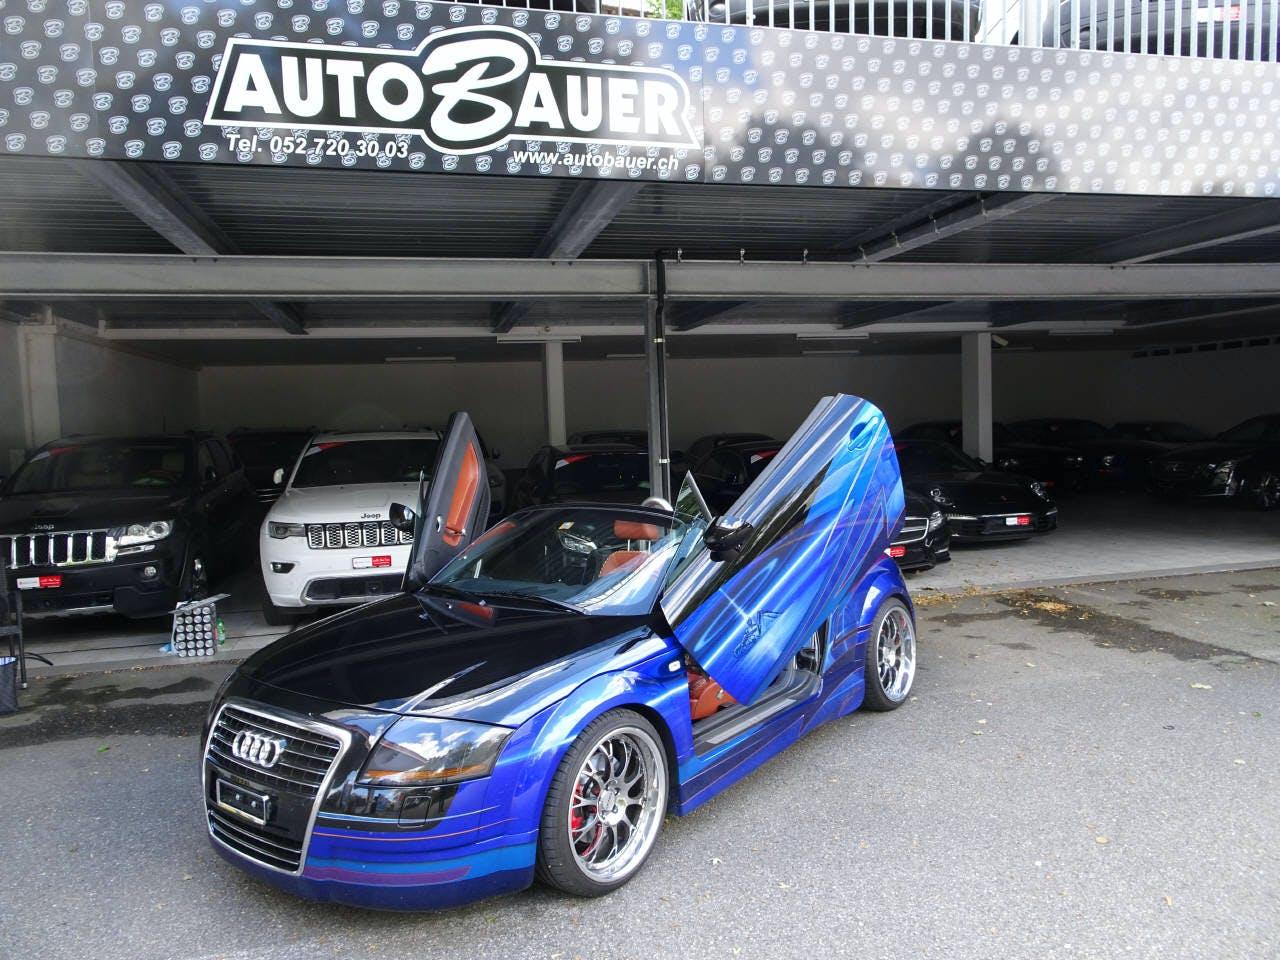 cabriolet Audi TT Roadster 1.8 20V Turbo 225 quattro ES